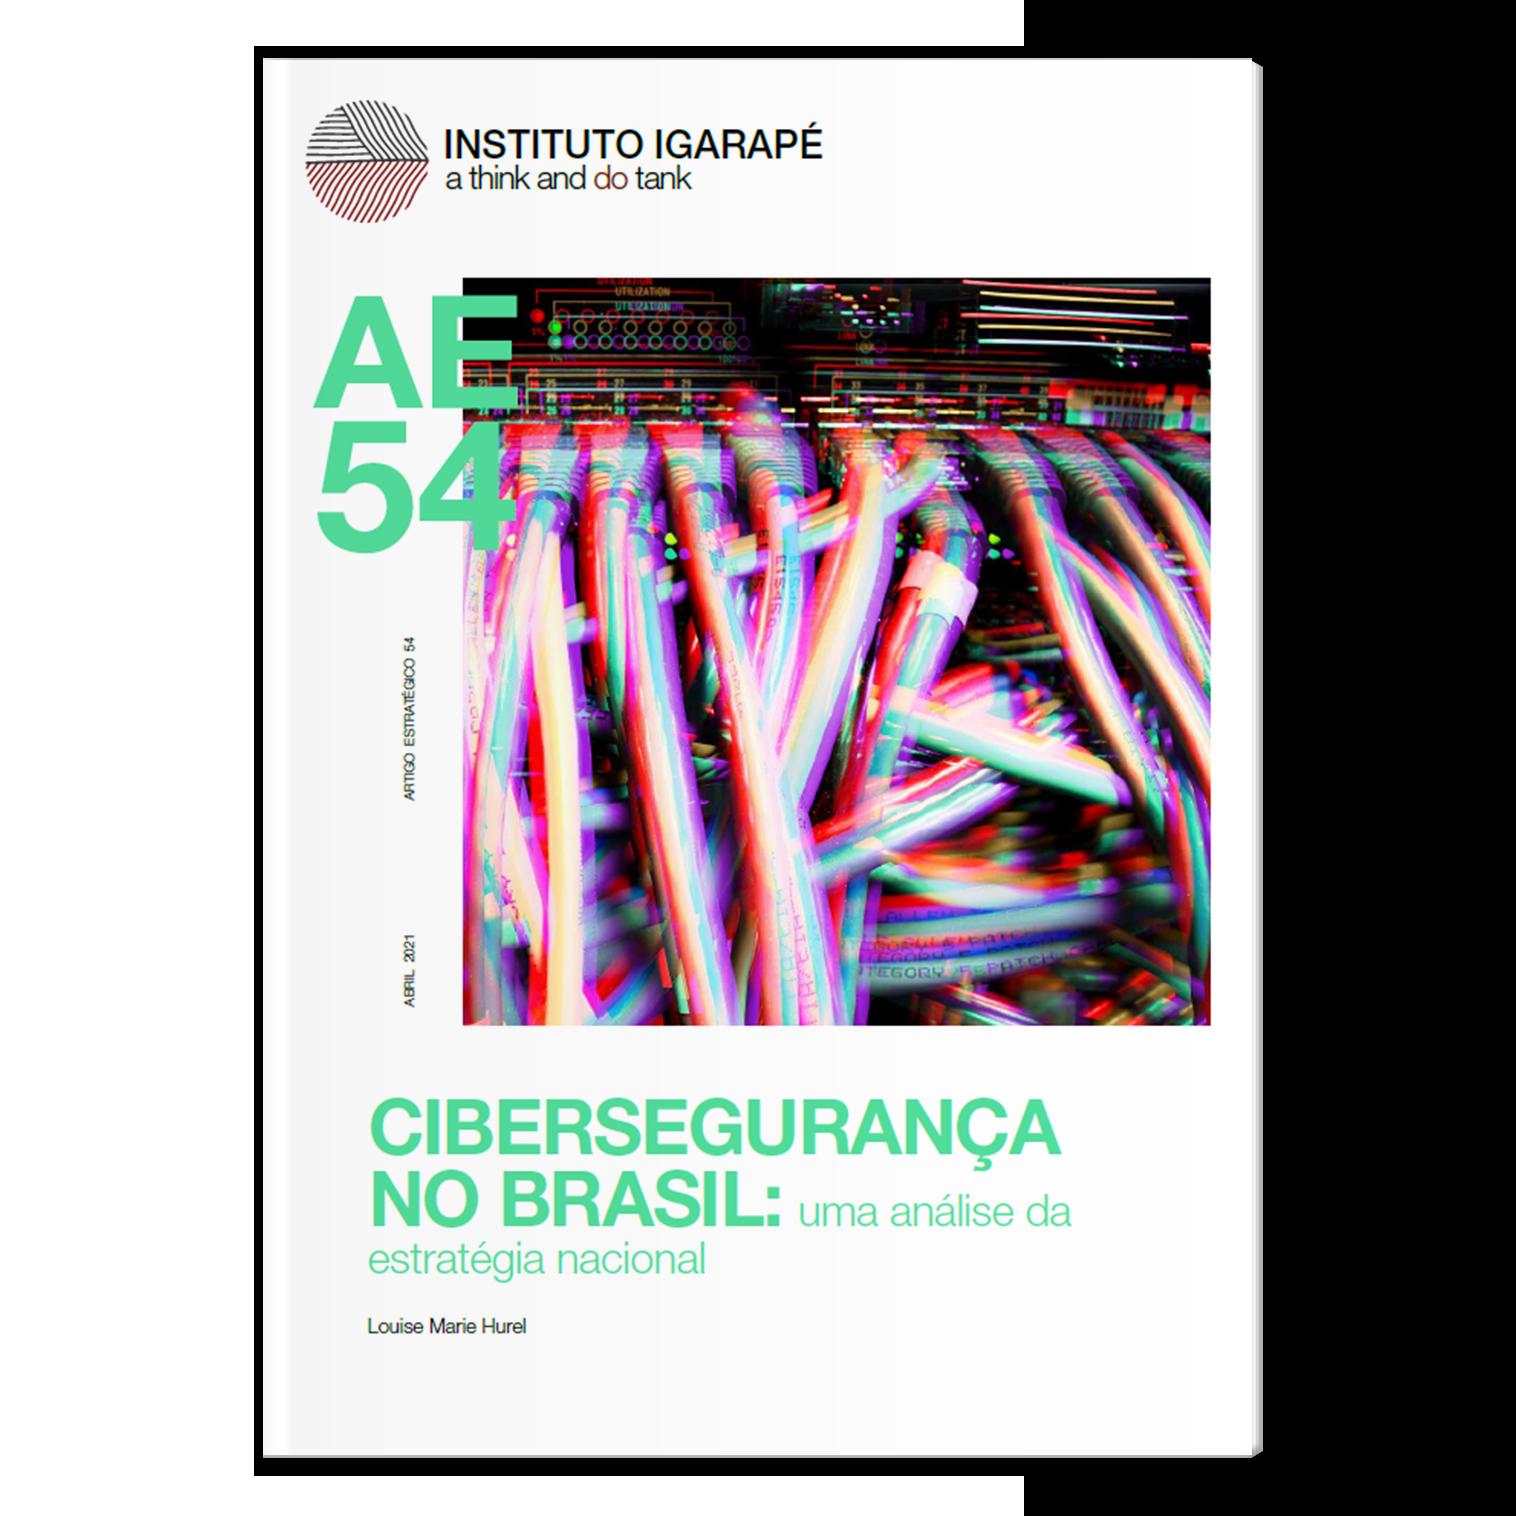 AE54 Ciberseguranca no Brasil